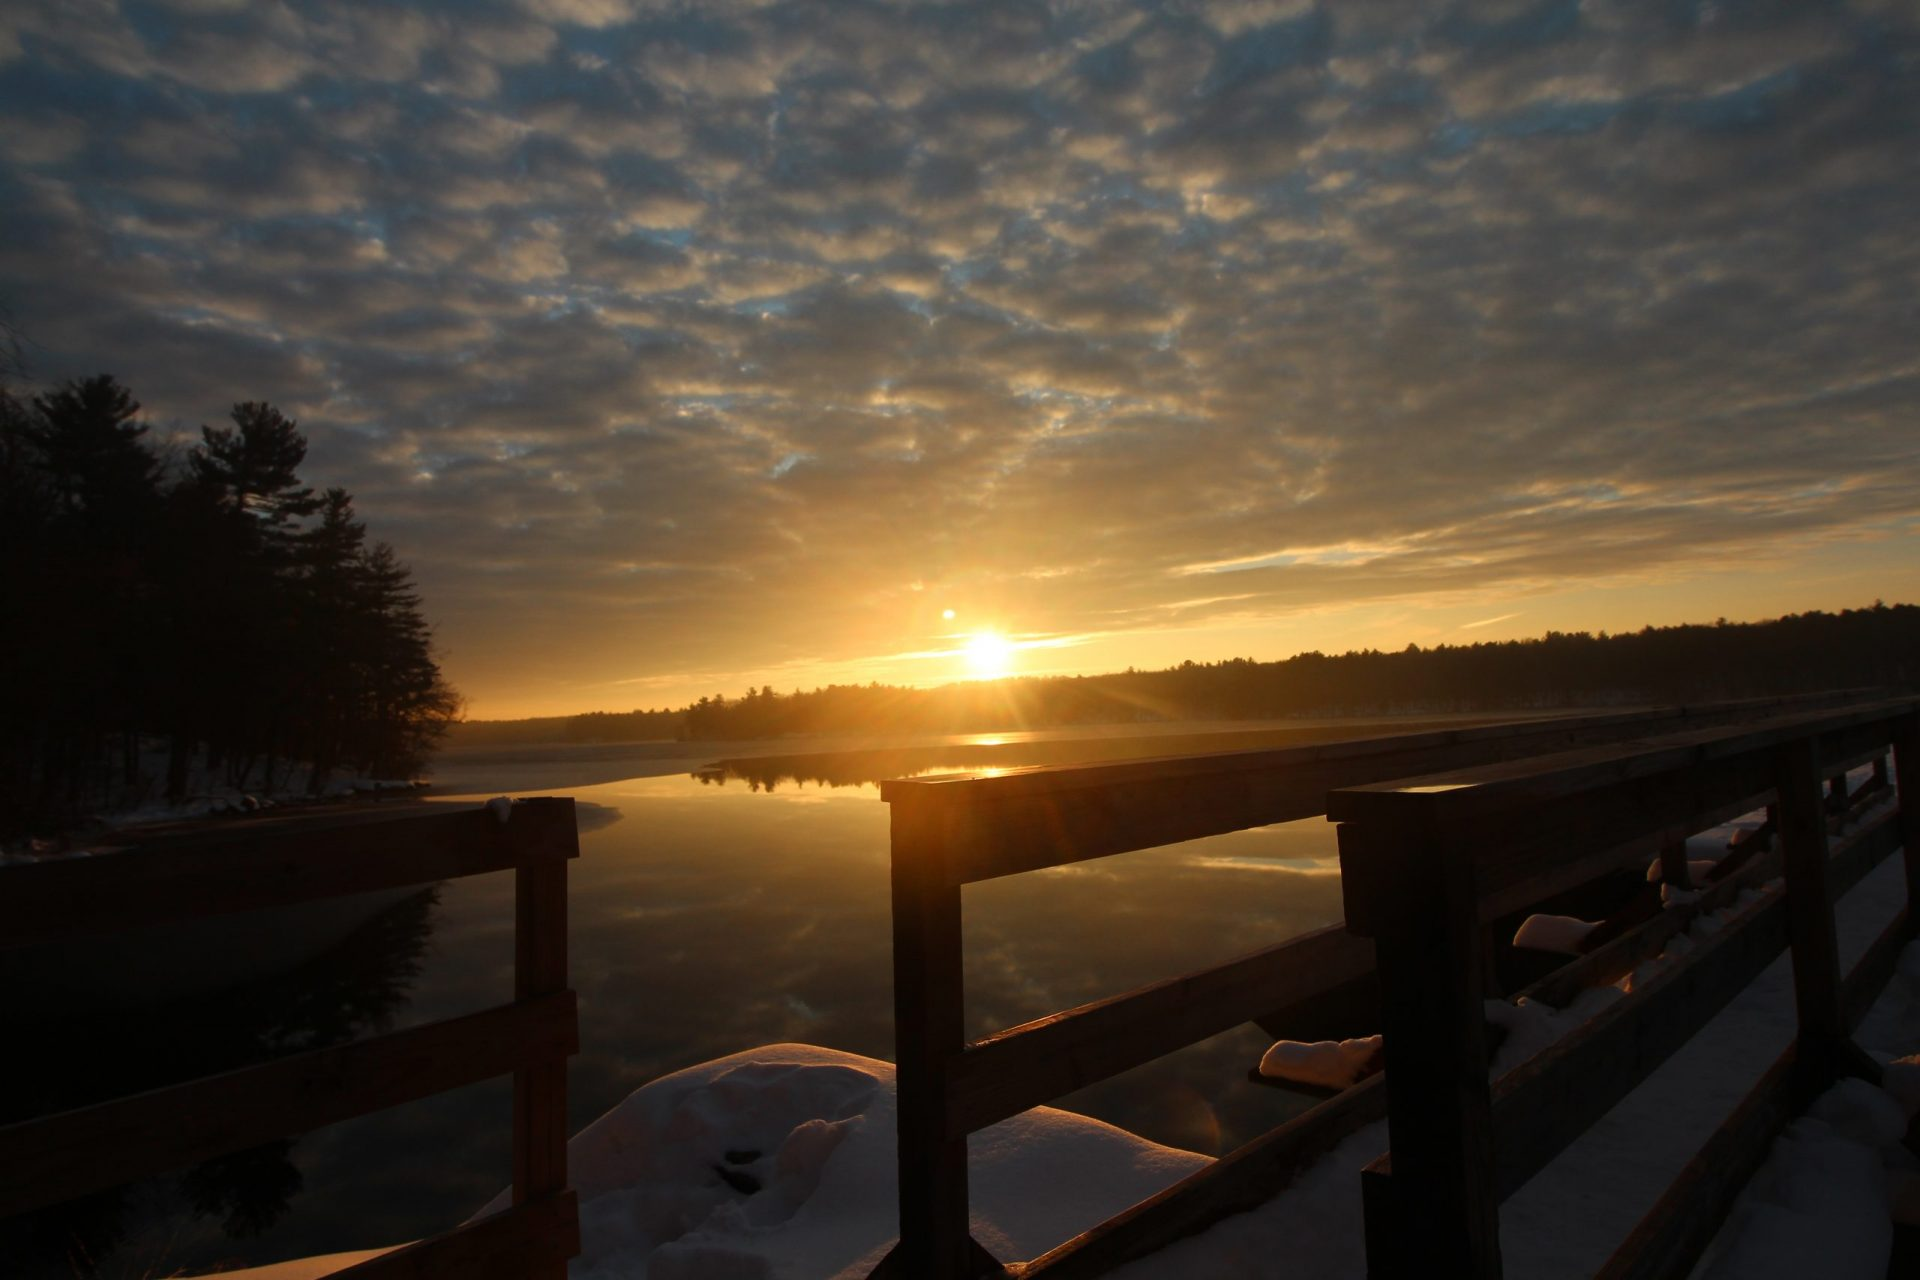 Sunset from pedestrian bridge - Ashland Dam - December 2020